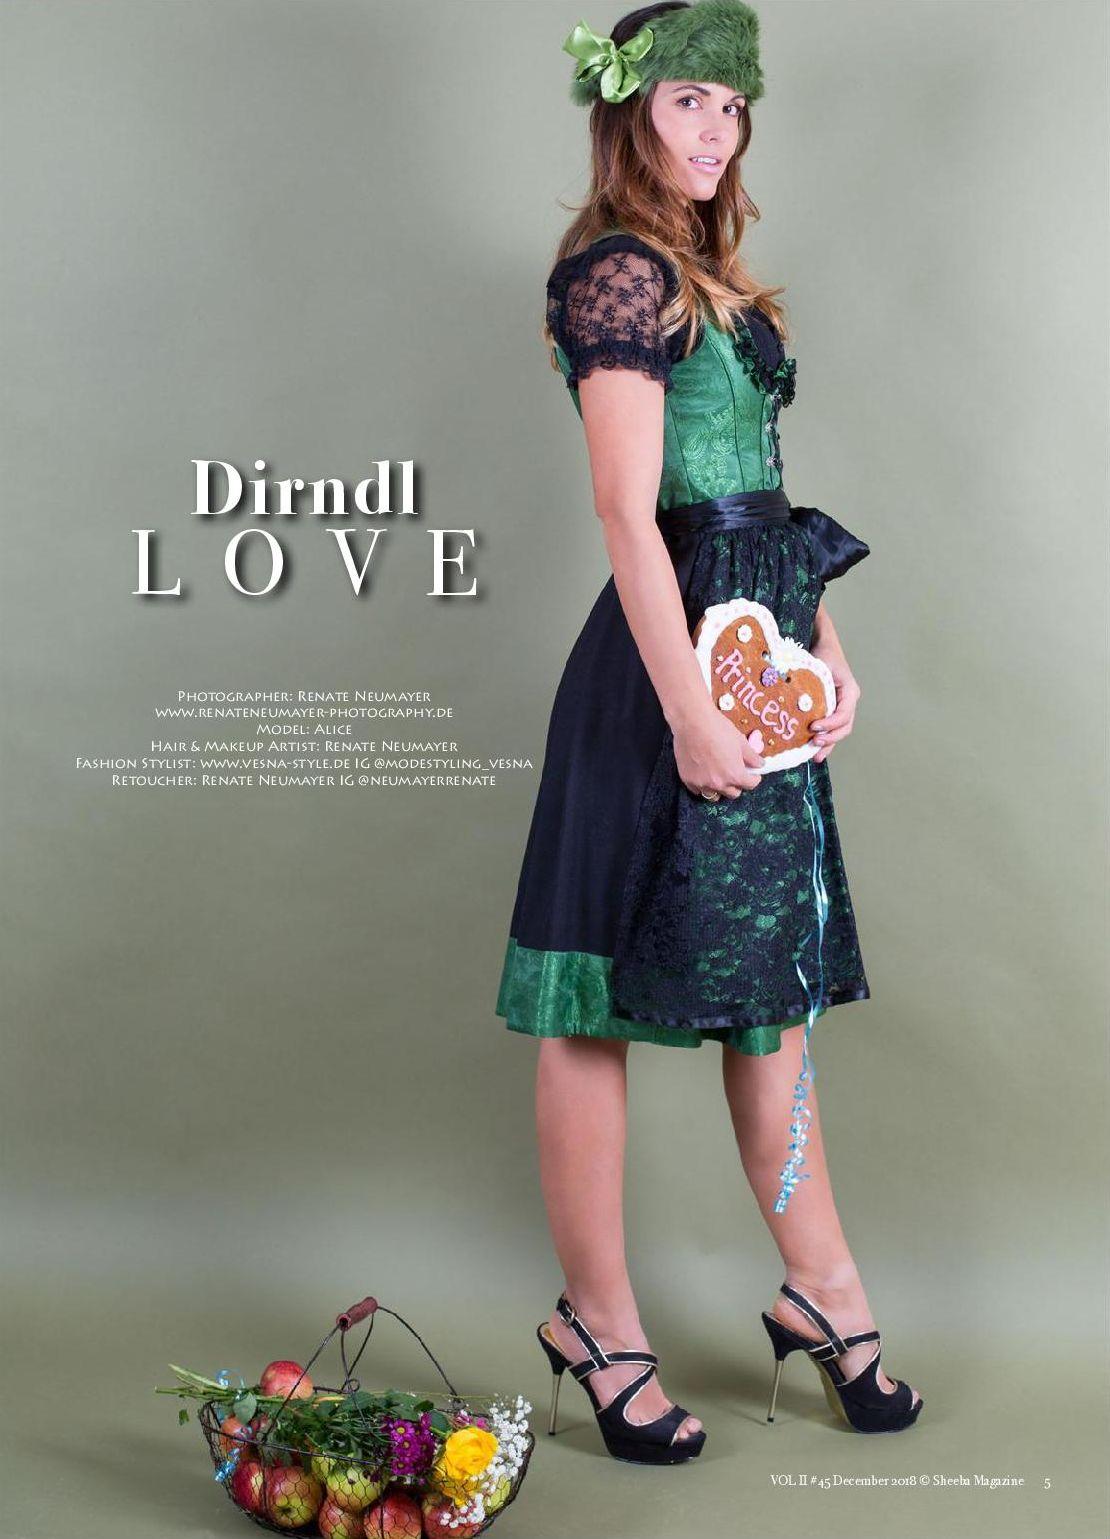 Dirndl Love - SHEEBA UK, December 2018 No. 45 Vol. II